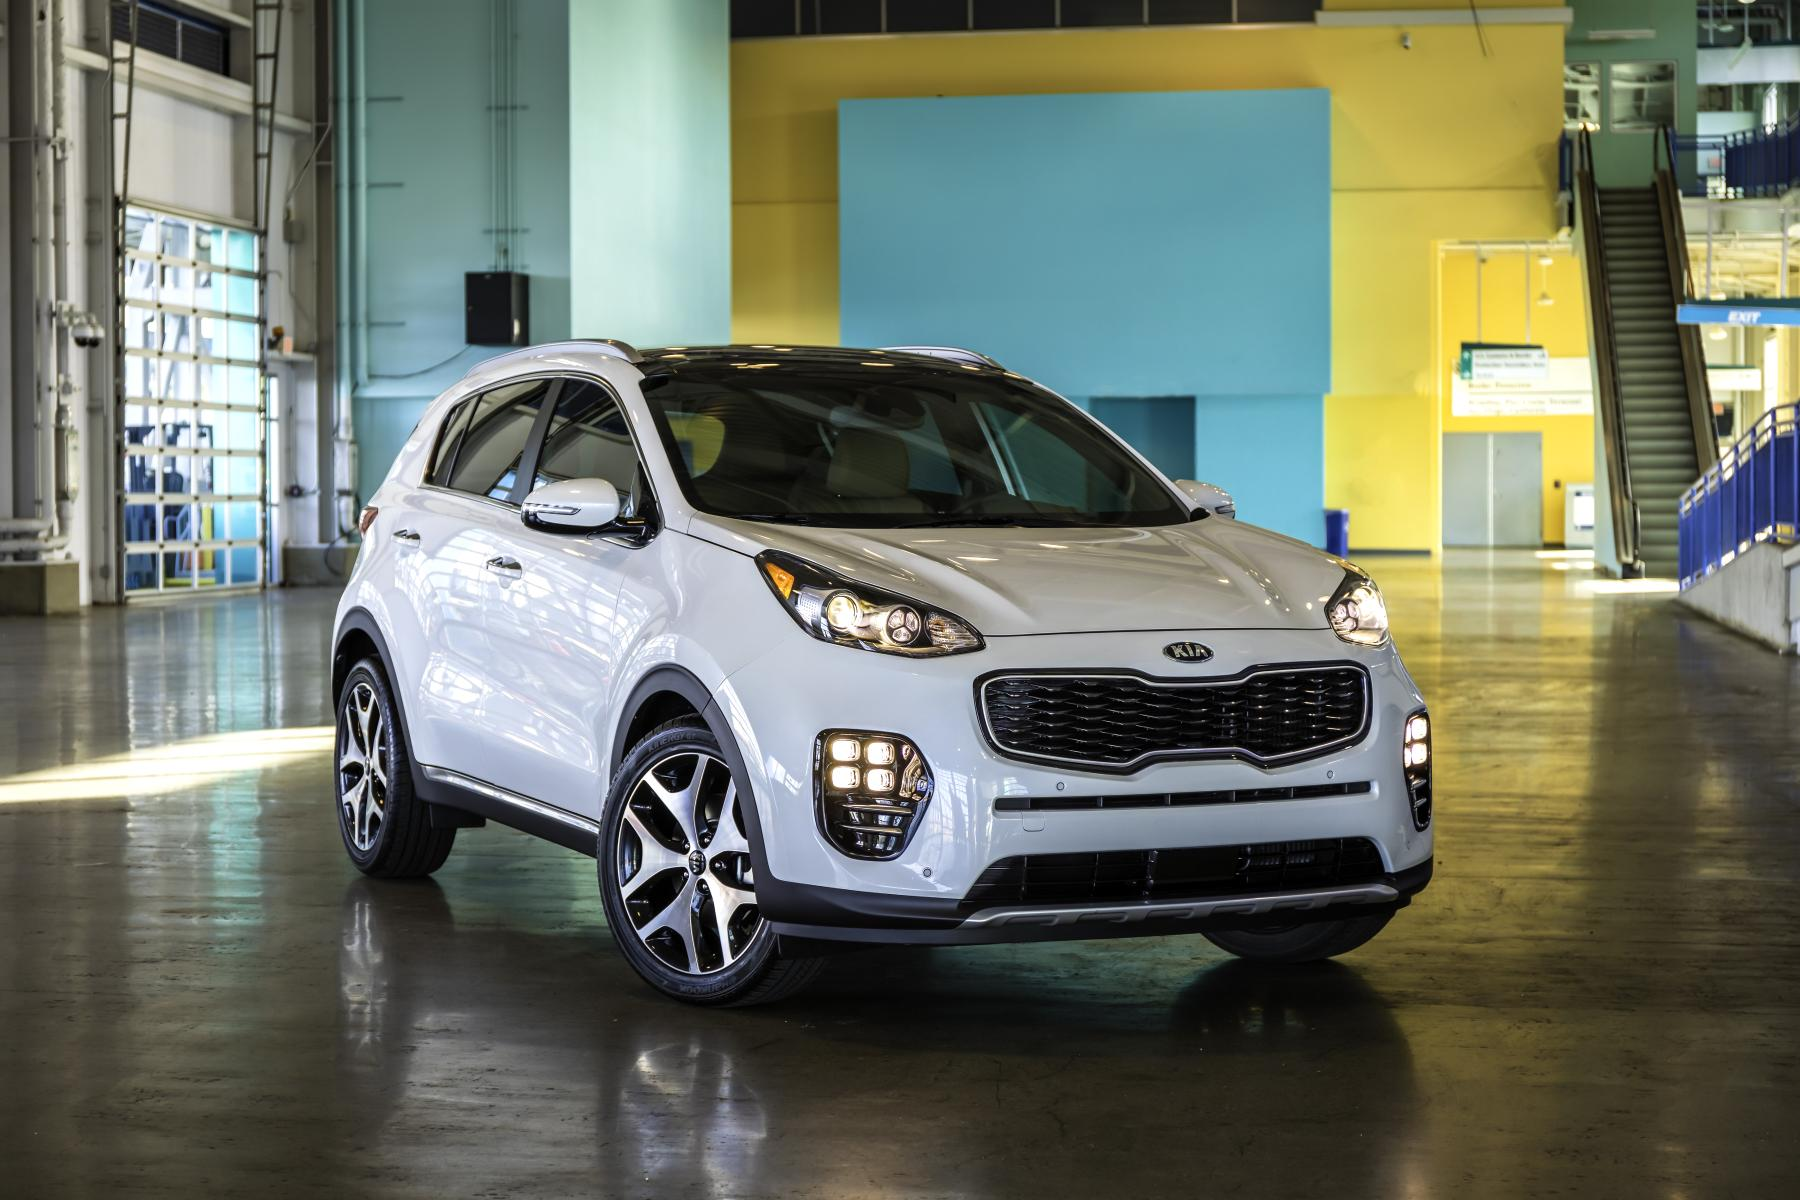 2017 Kia Sportage Makes North American Debut - autoevolution